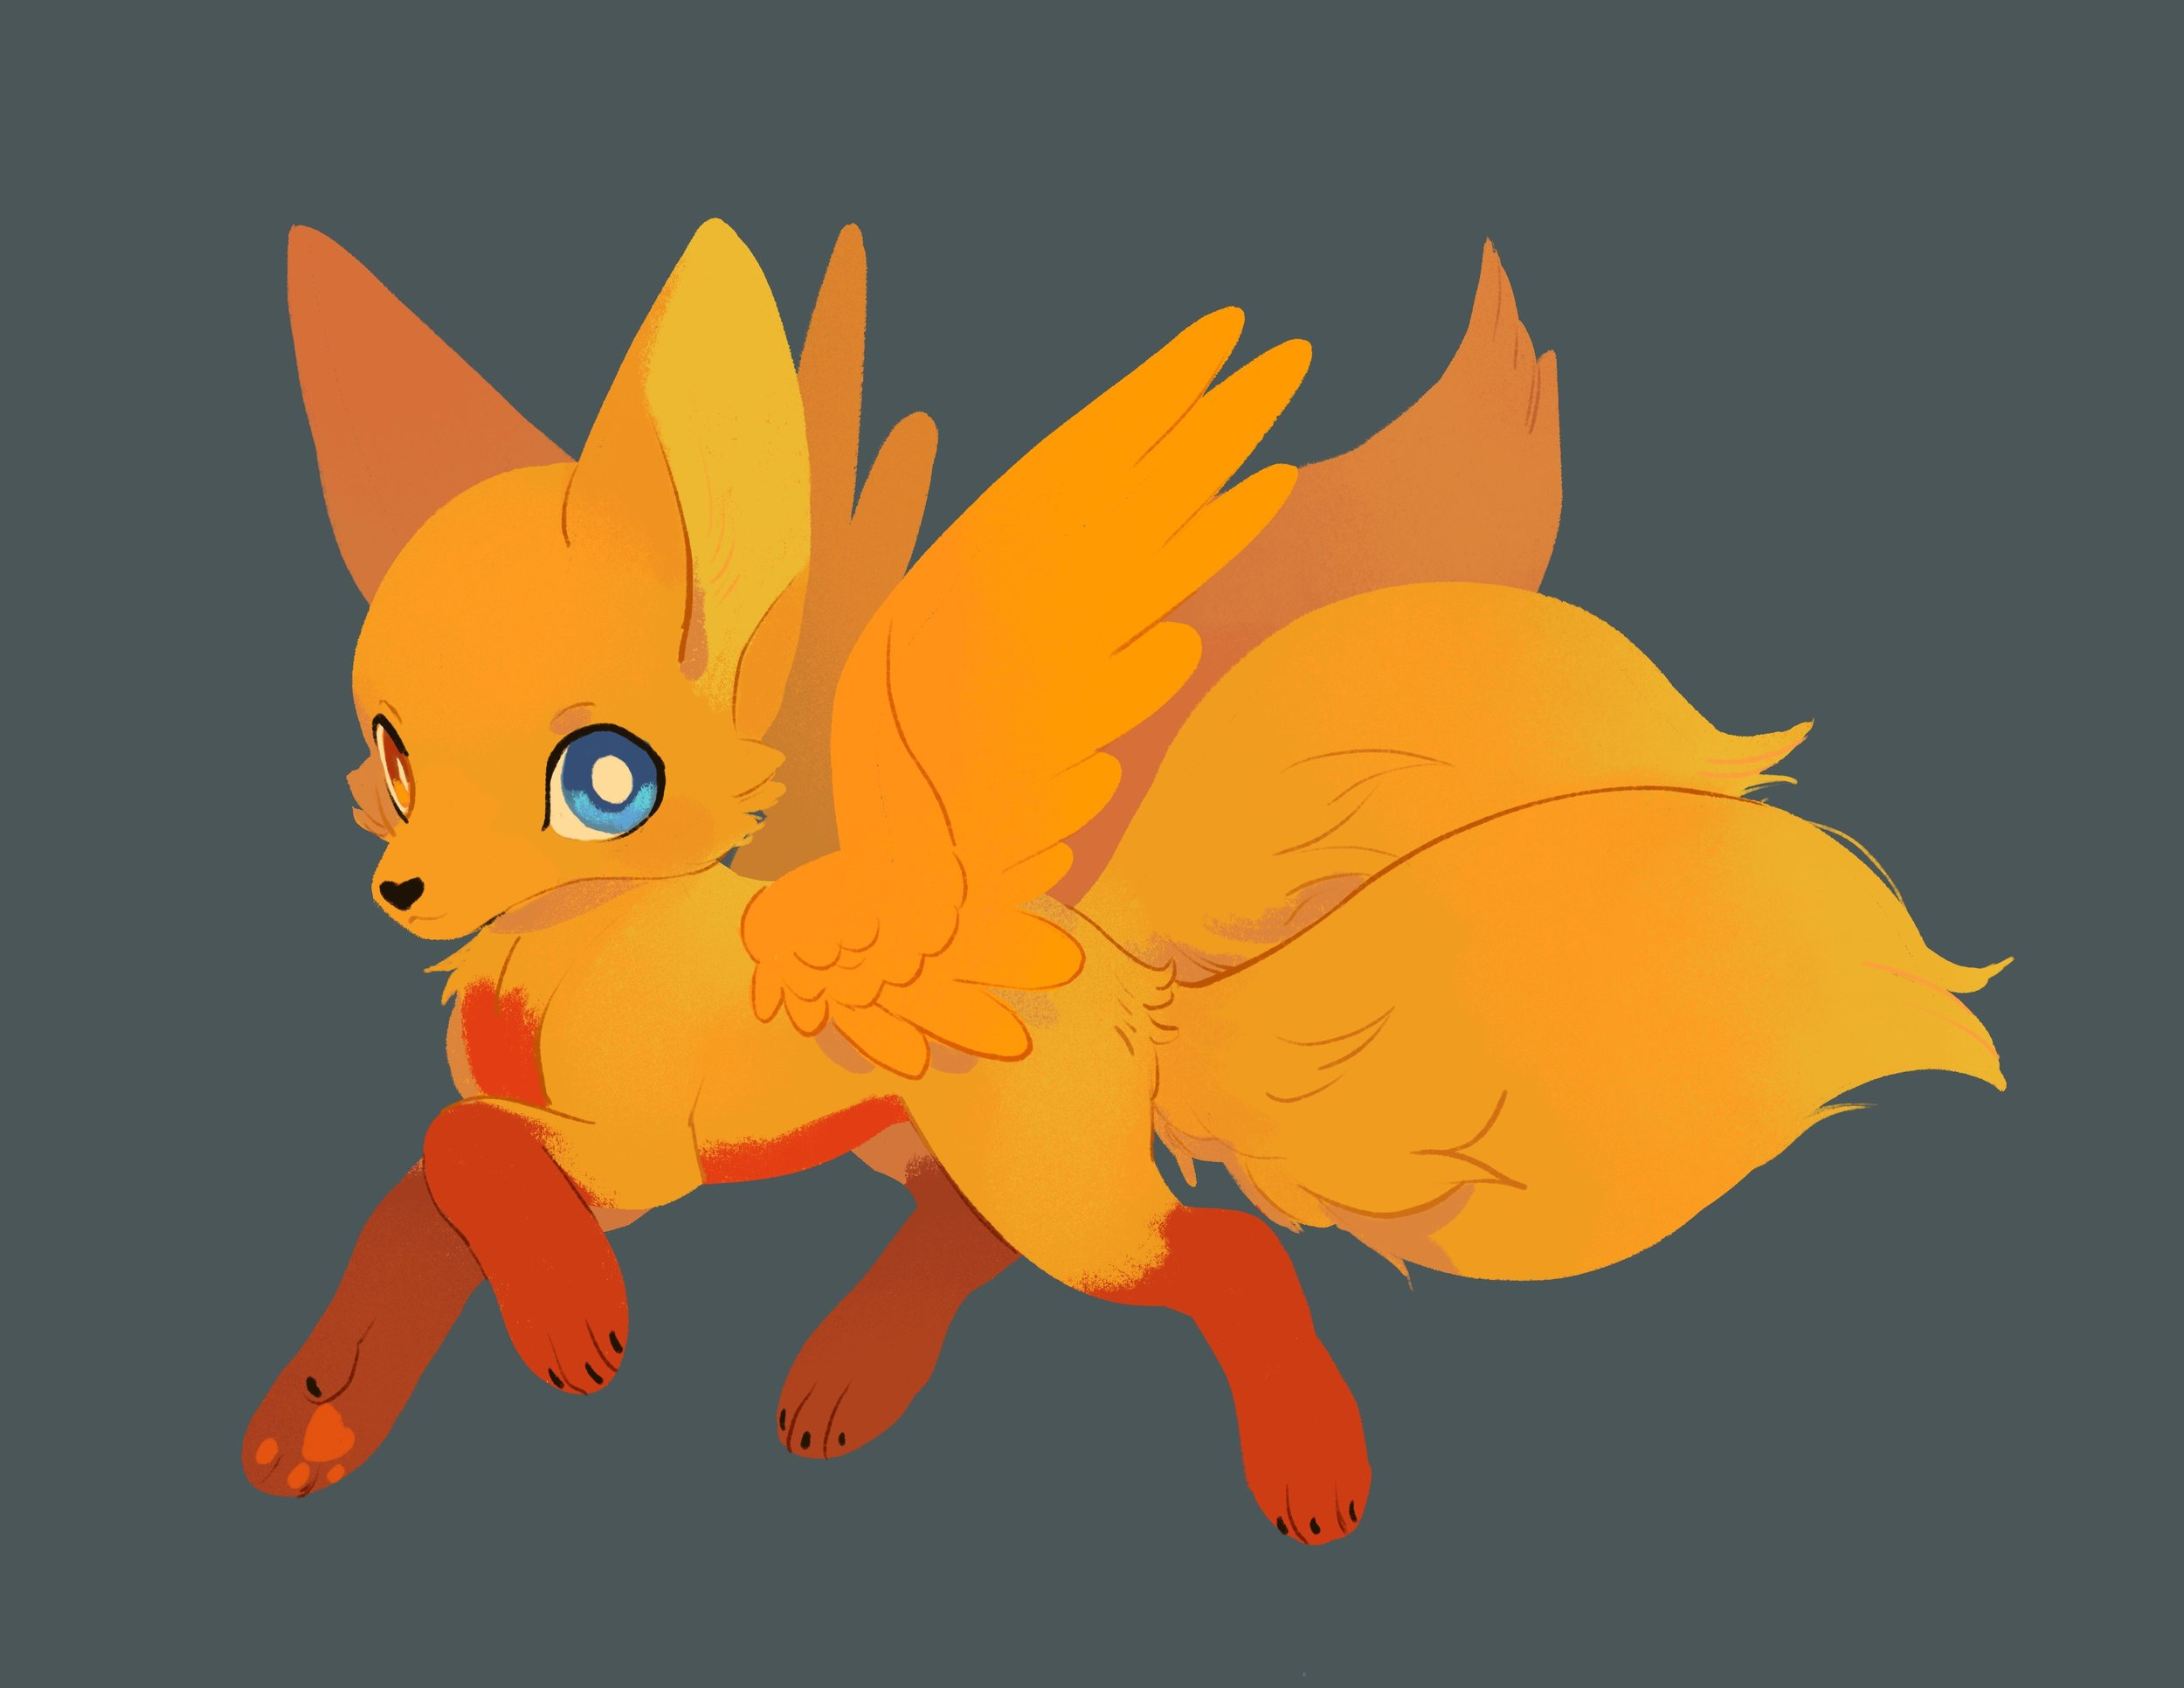 Many thanks to  Katie O'Neill  for the illustration of Zora, Misti's companion animal.